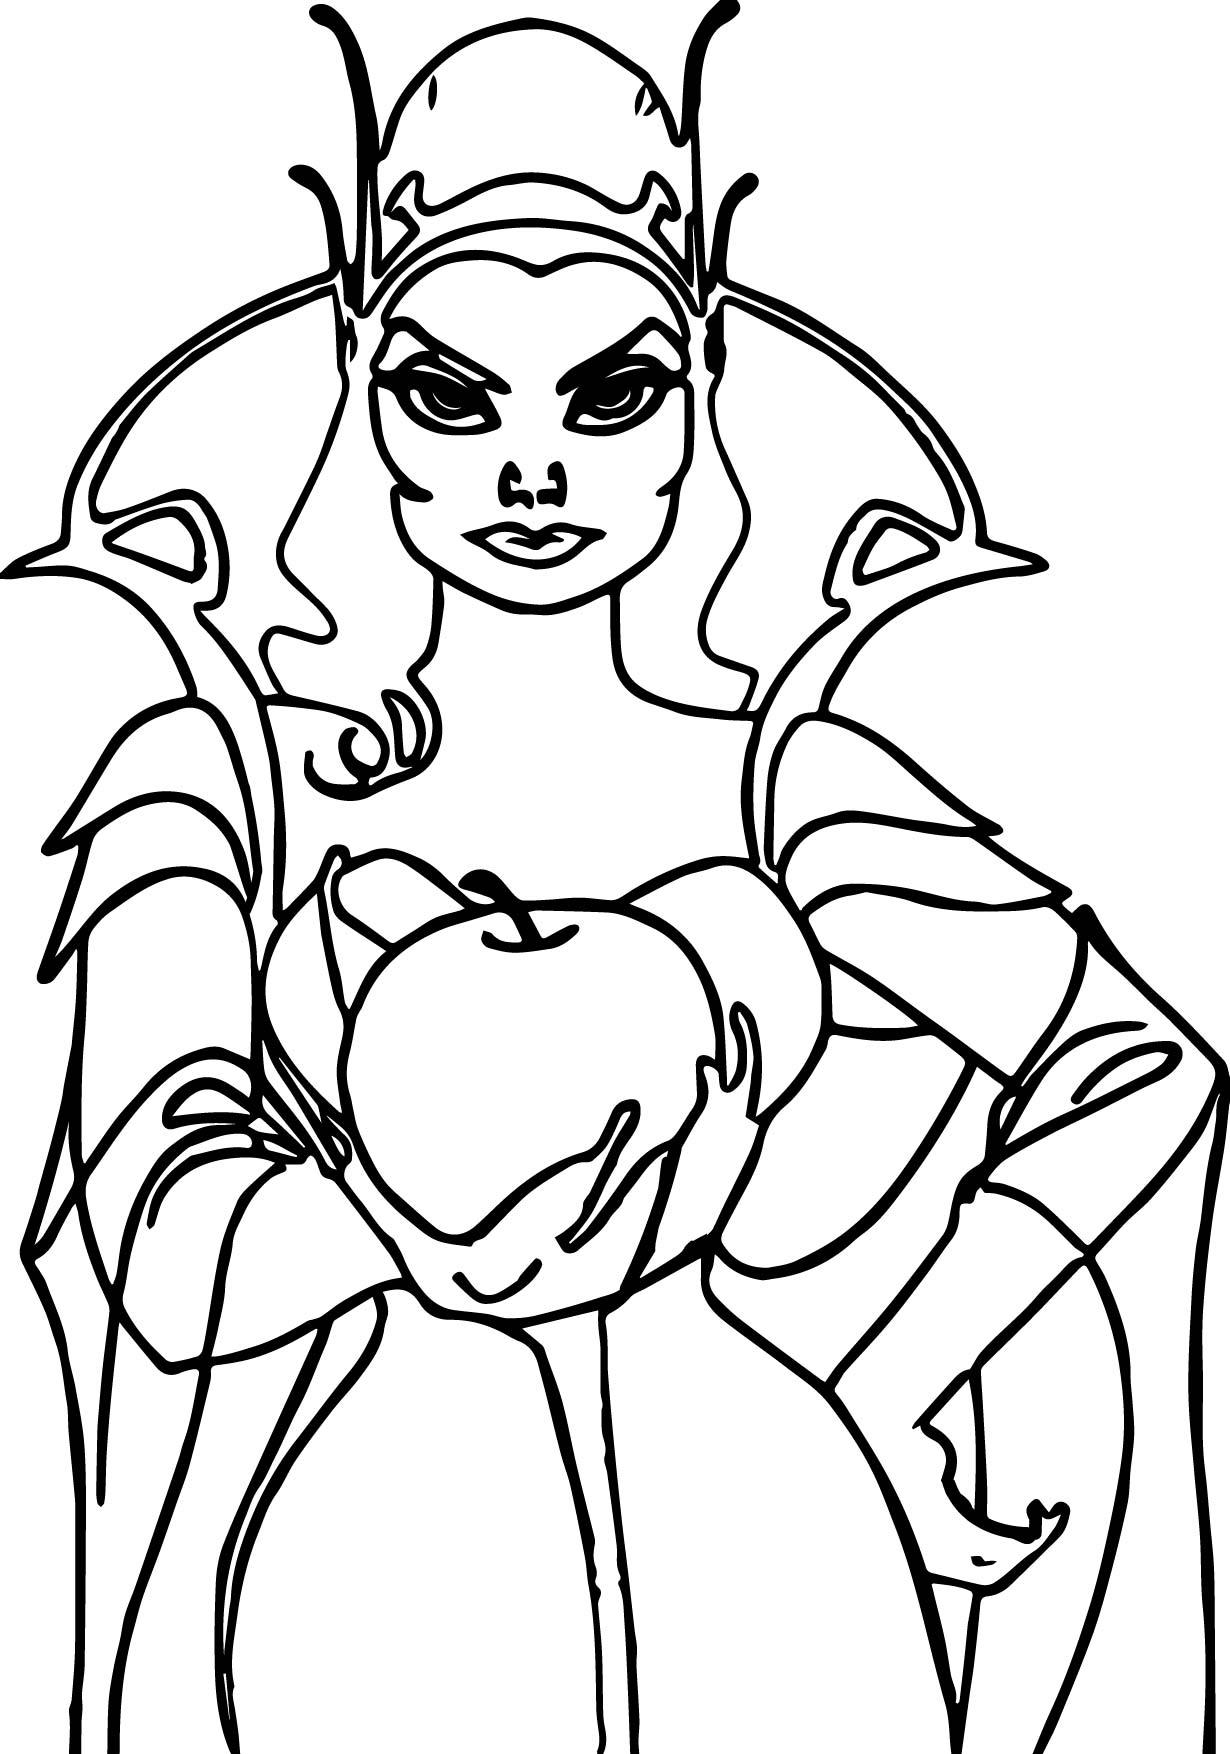 Disney Enchanted Bad Woman Coloring Page